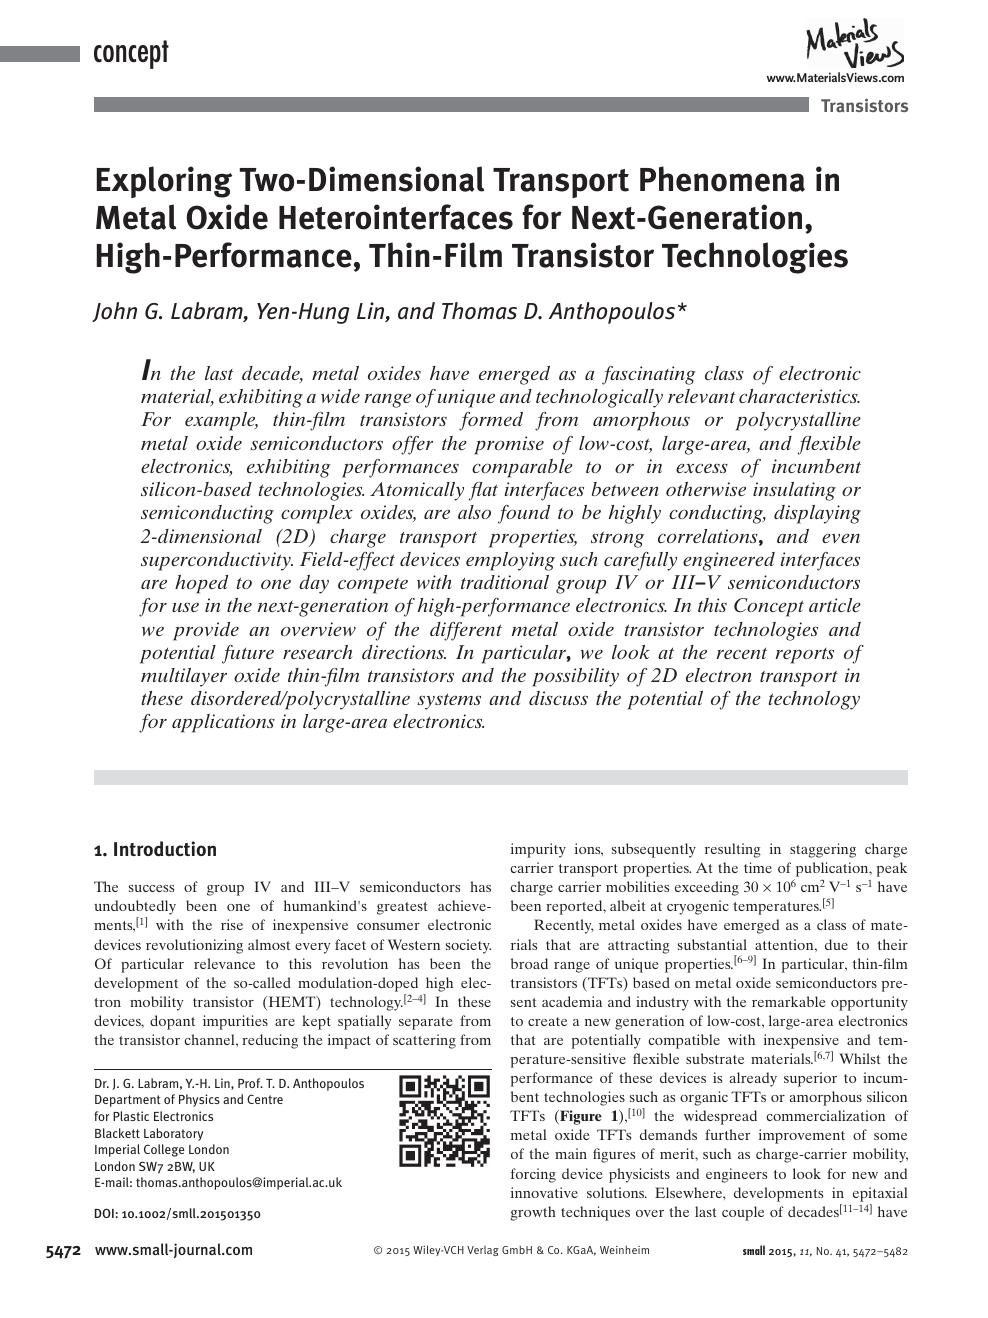 Exploring Two Dimensional Transport Phenomena in Metal Oxide ...